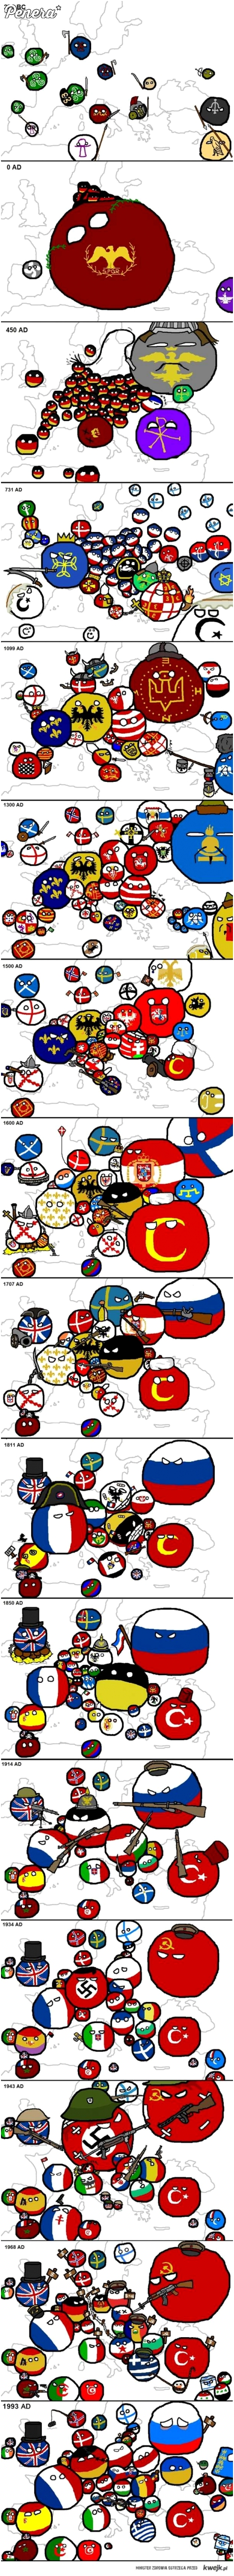 Hisrtoia Europy